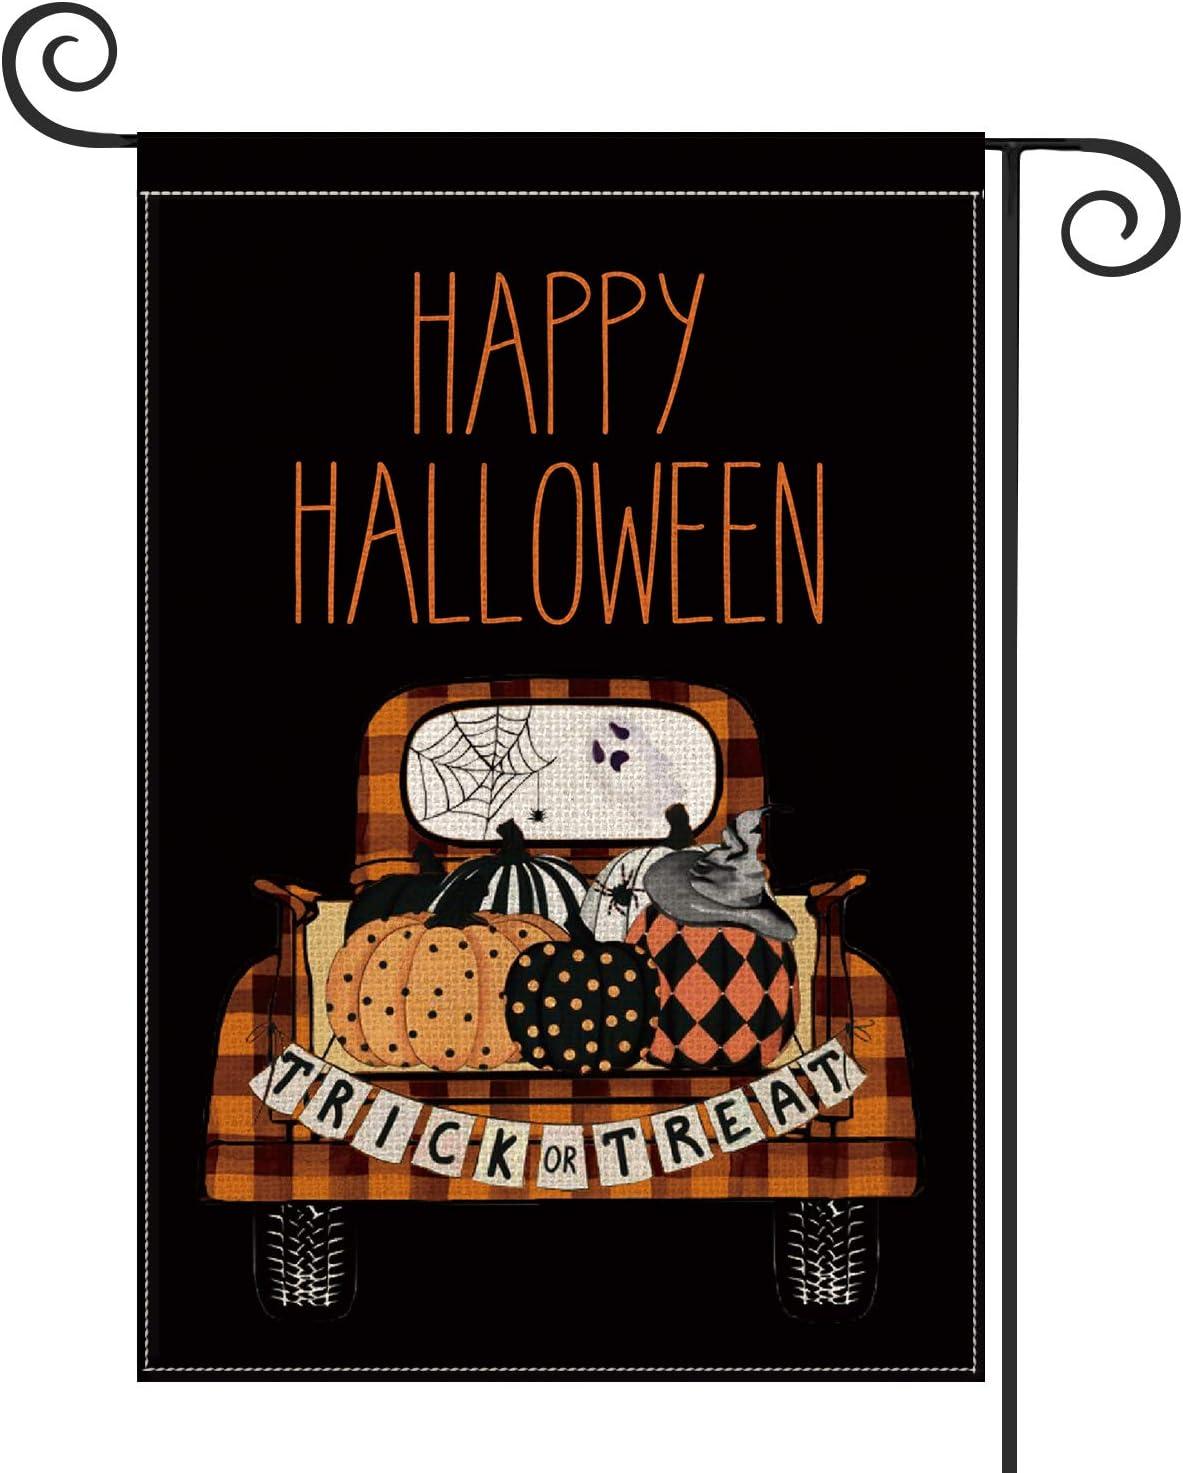 AVOIN Happy Halloween Truck Polka Dot Pumpkin Garden Flag Vertical Double Sized, Trick or Treat Spider Web Witch Hat Yard Outdoor Decoration 12.5 x 18 Inch